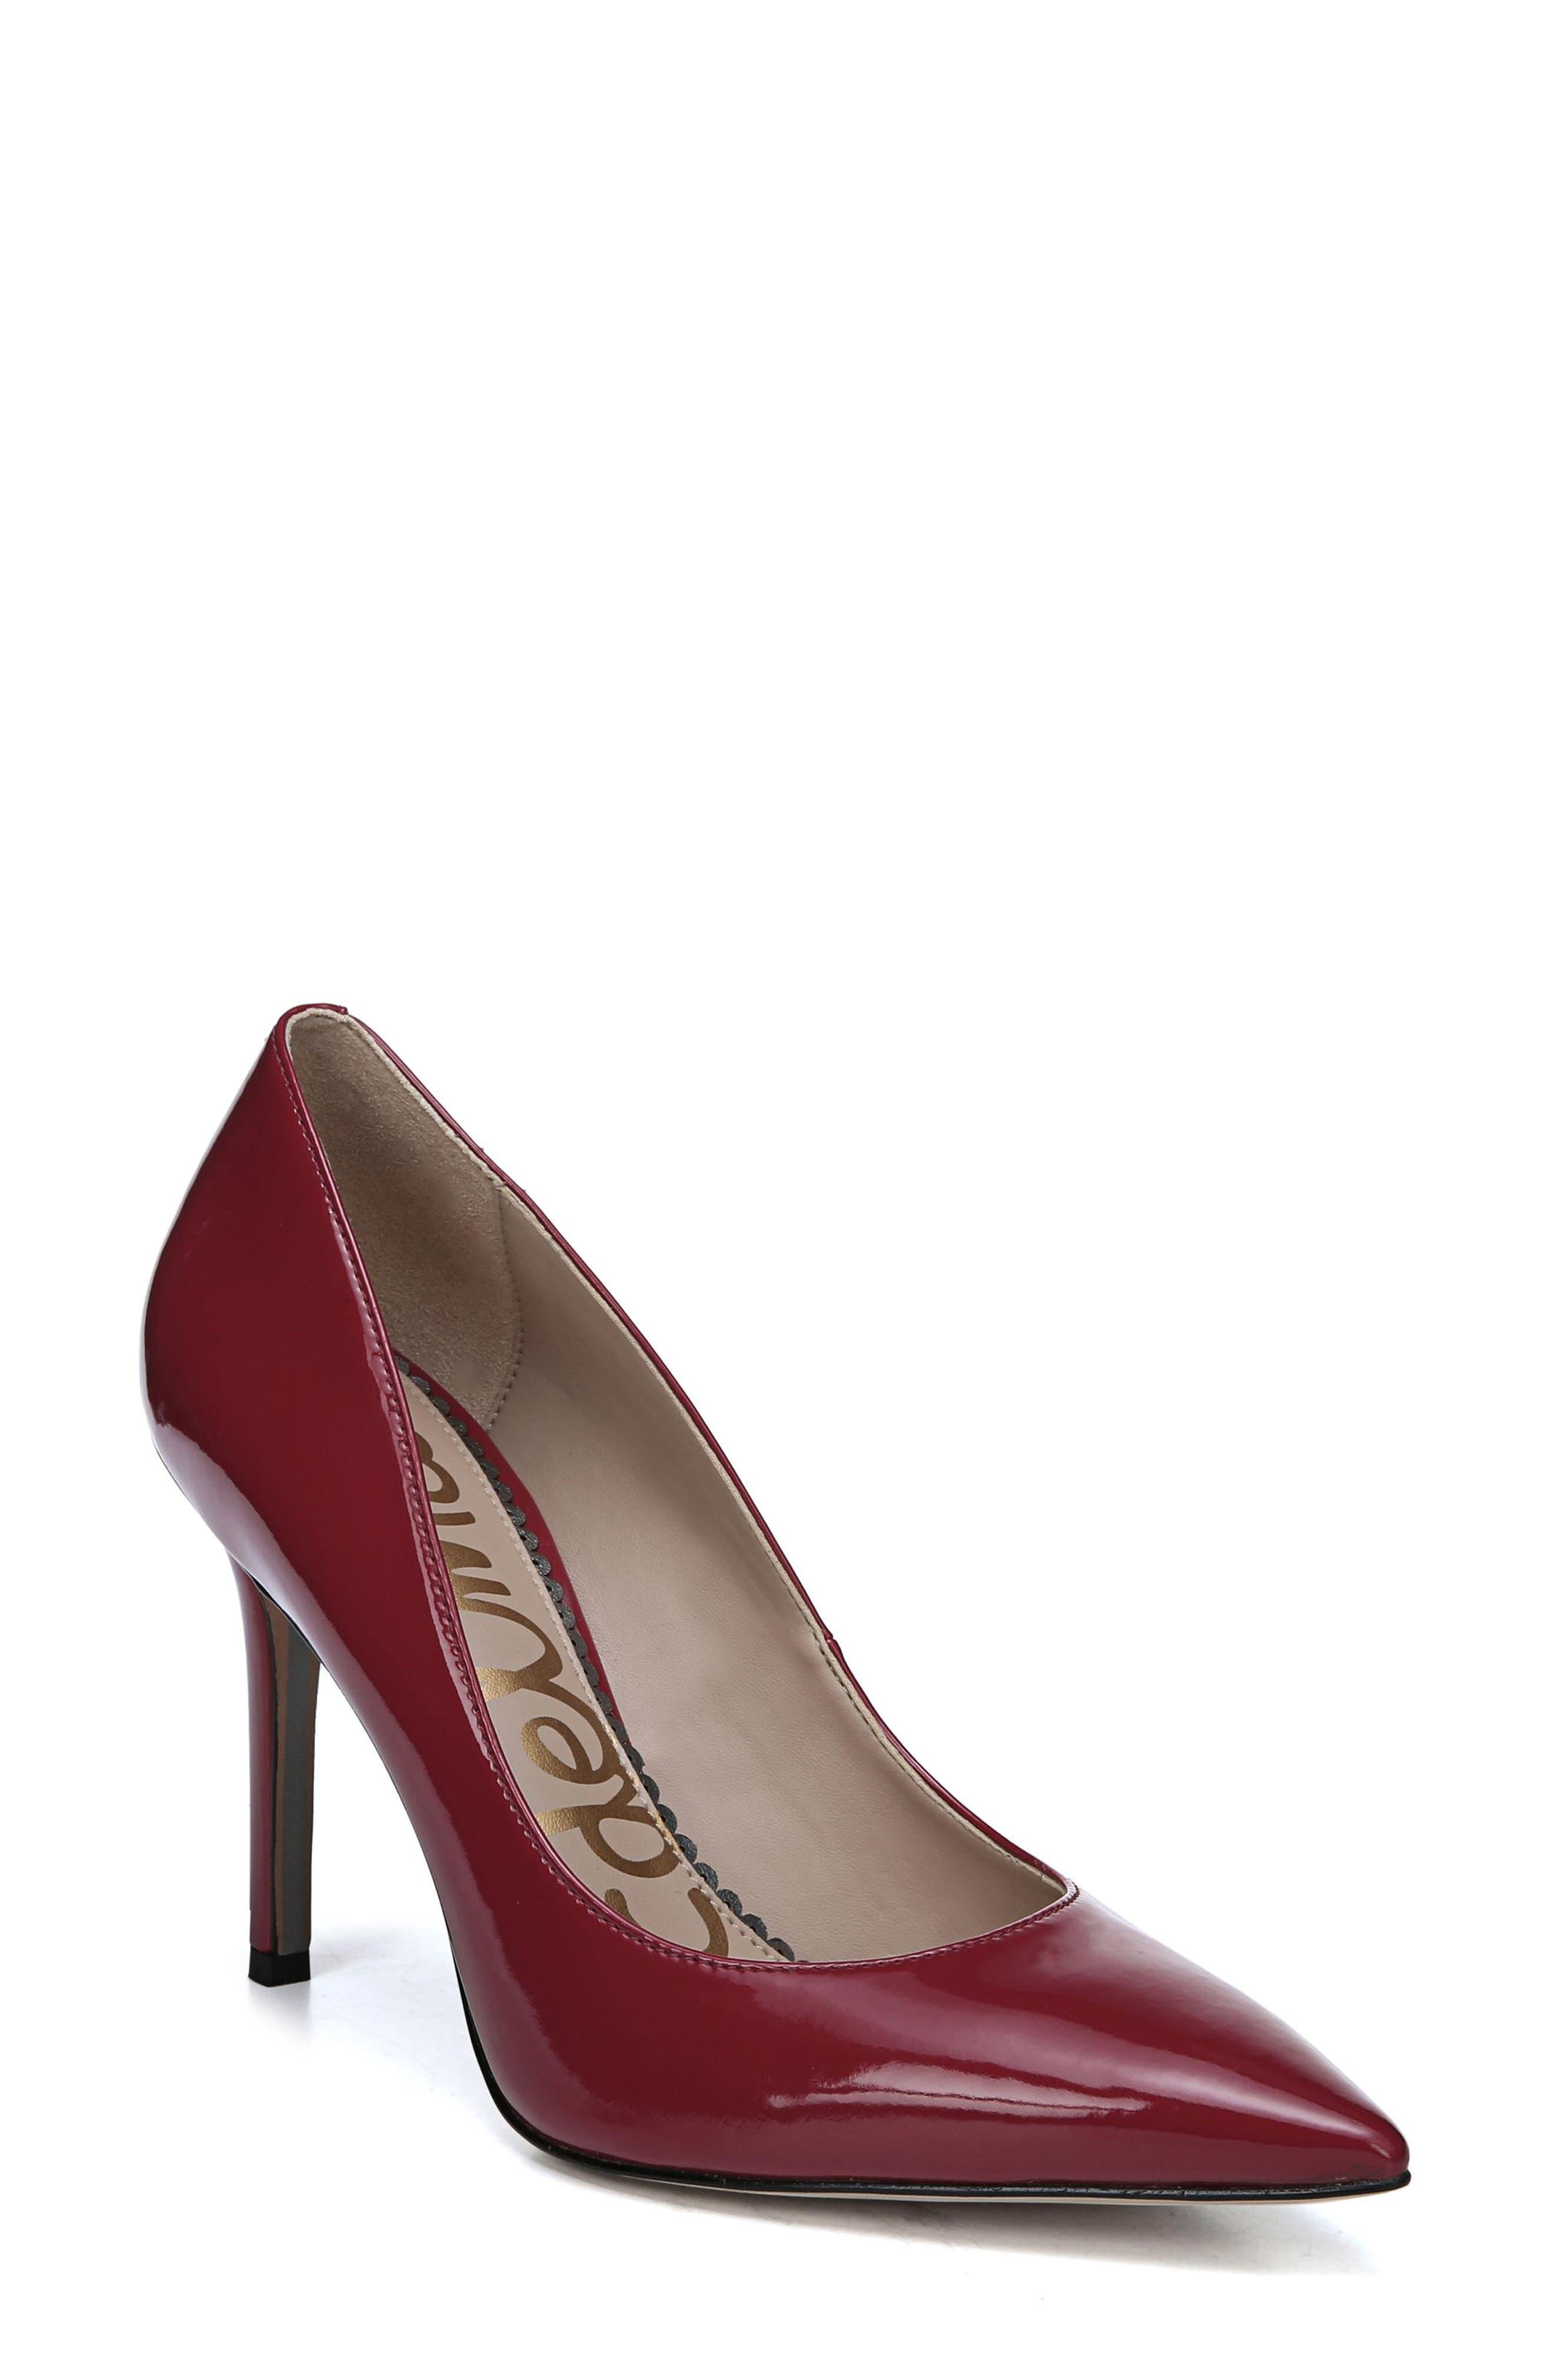 edcef7aca7f62 rosso and bianca nike high heels